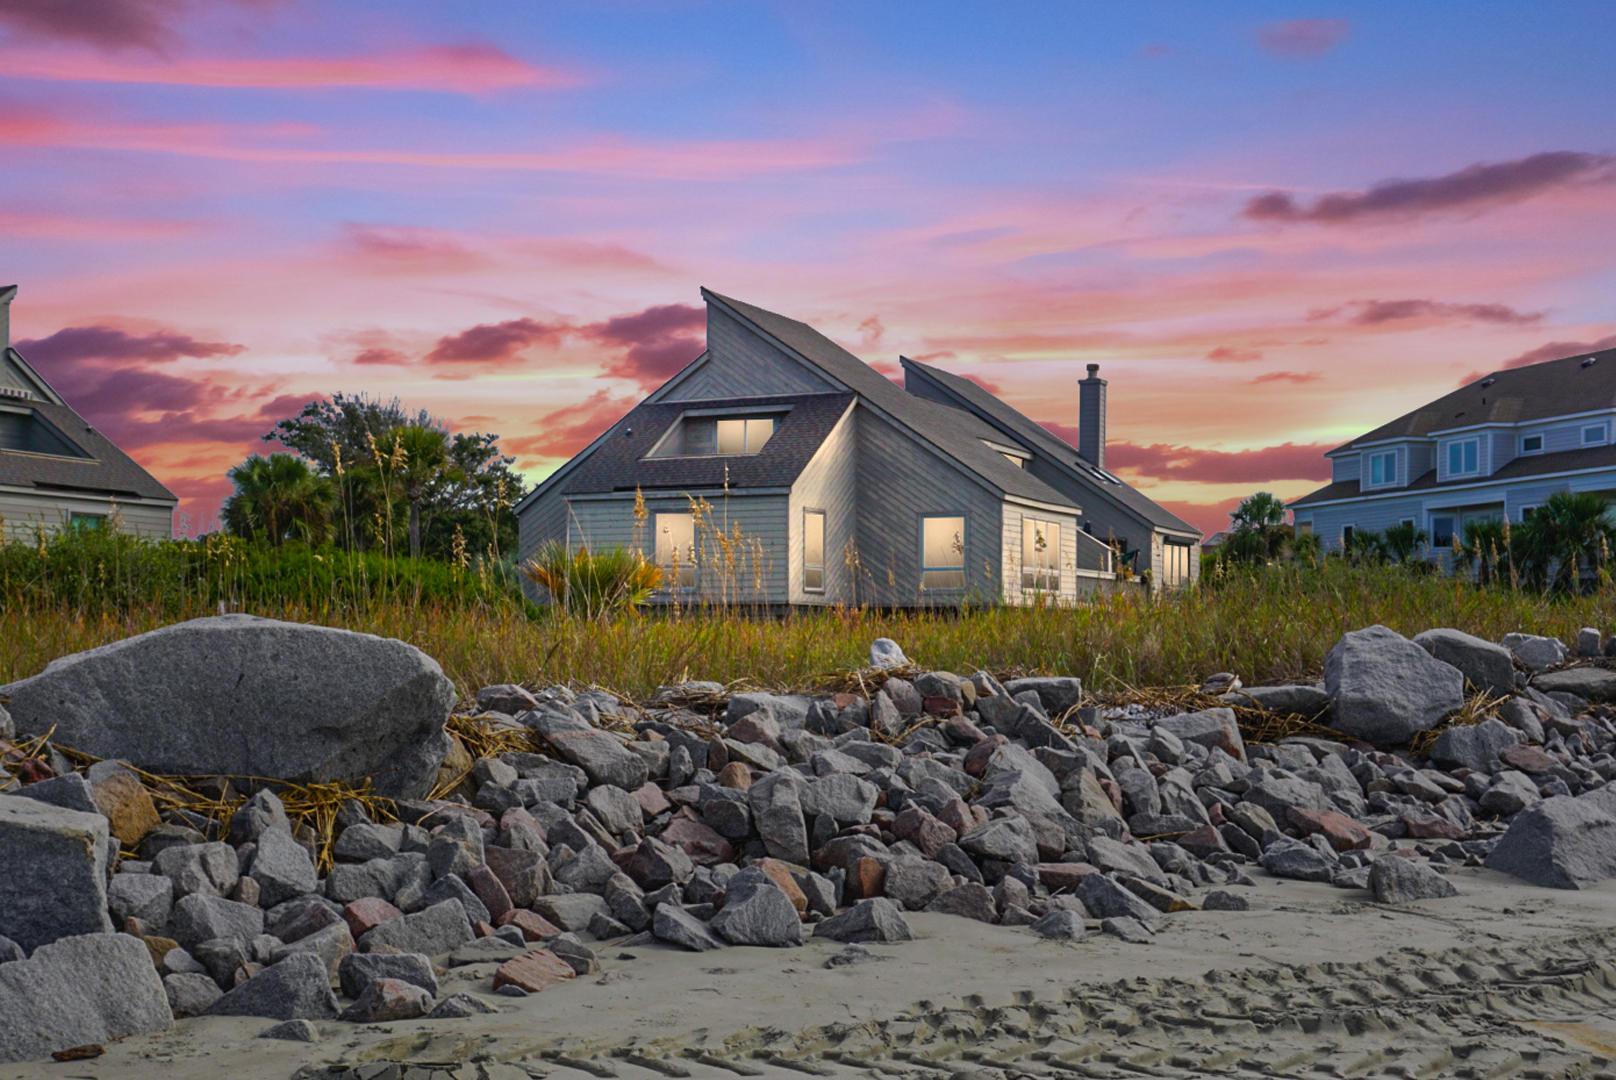 323 Seabrook Island Road Seabrook Island, SC 29455